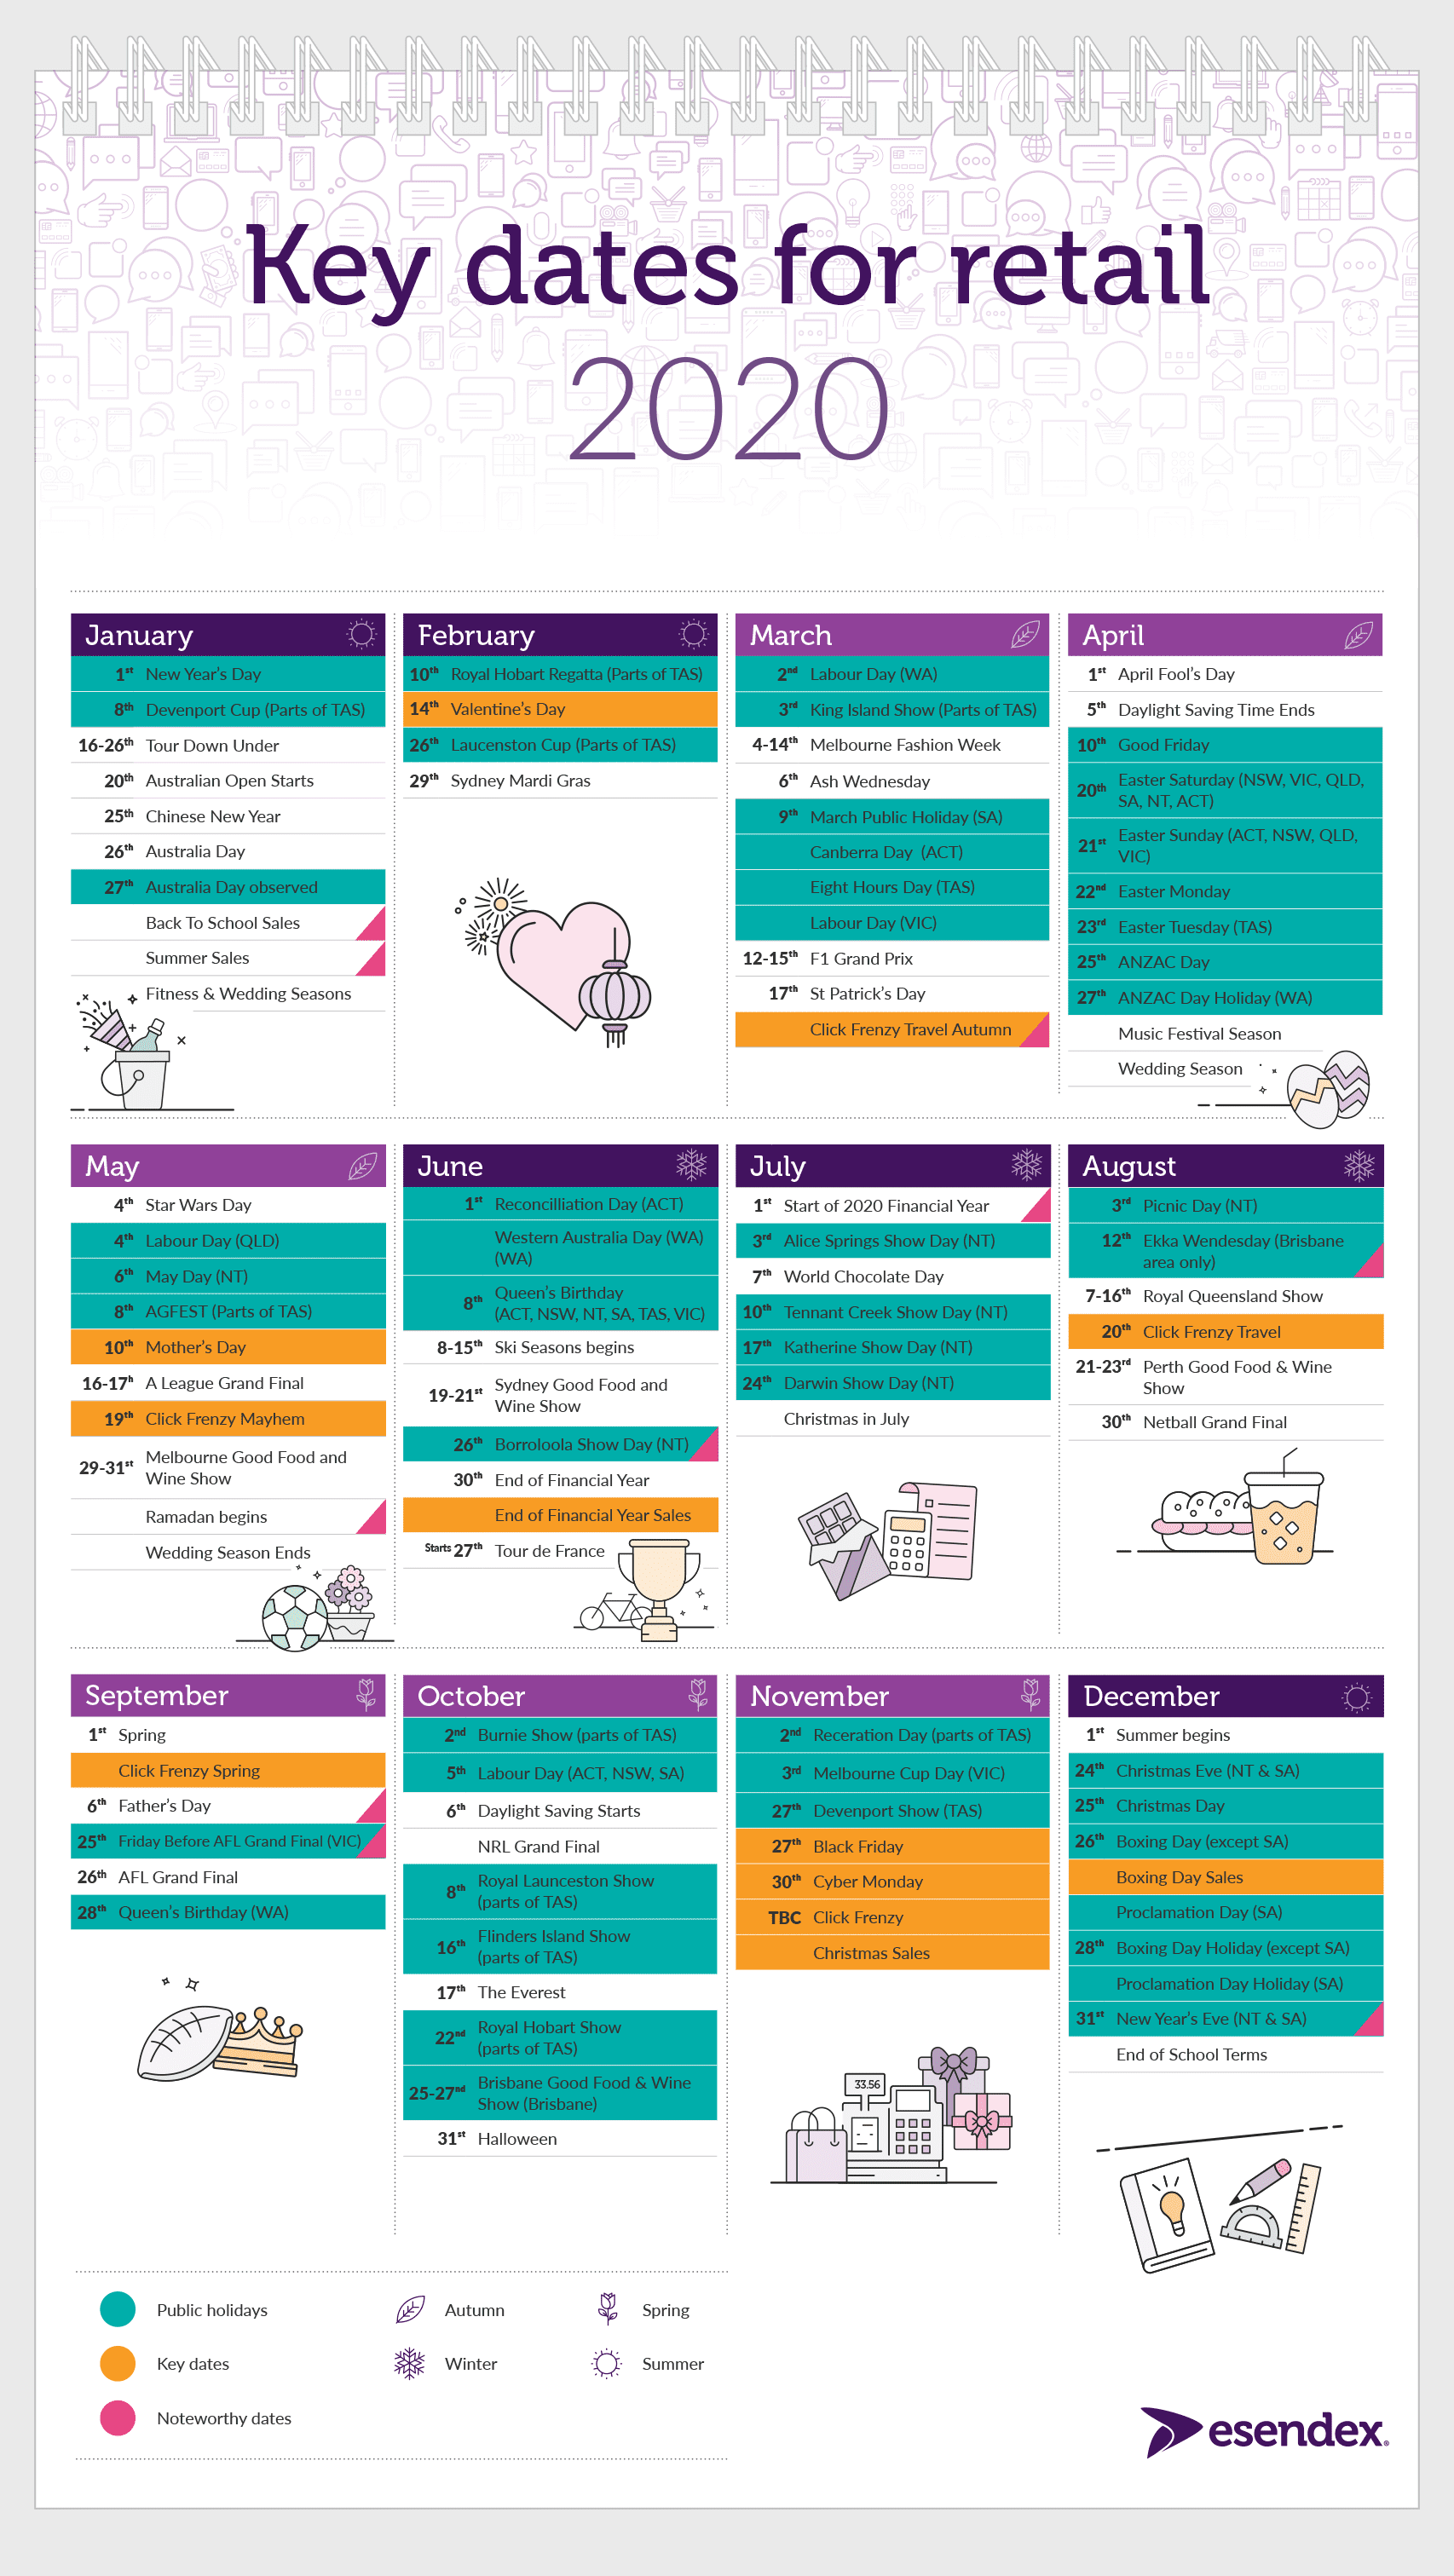 2020 Retailer Calendar for Australia